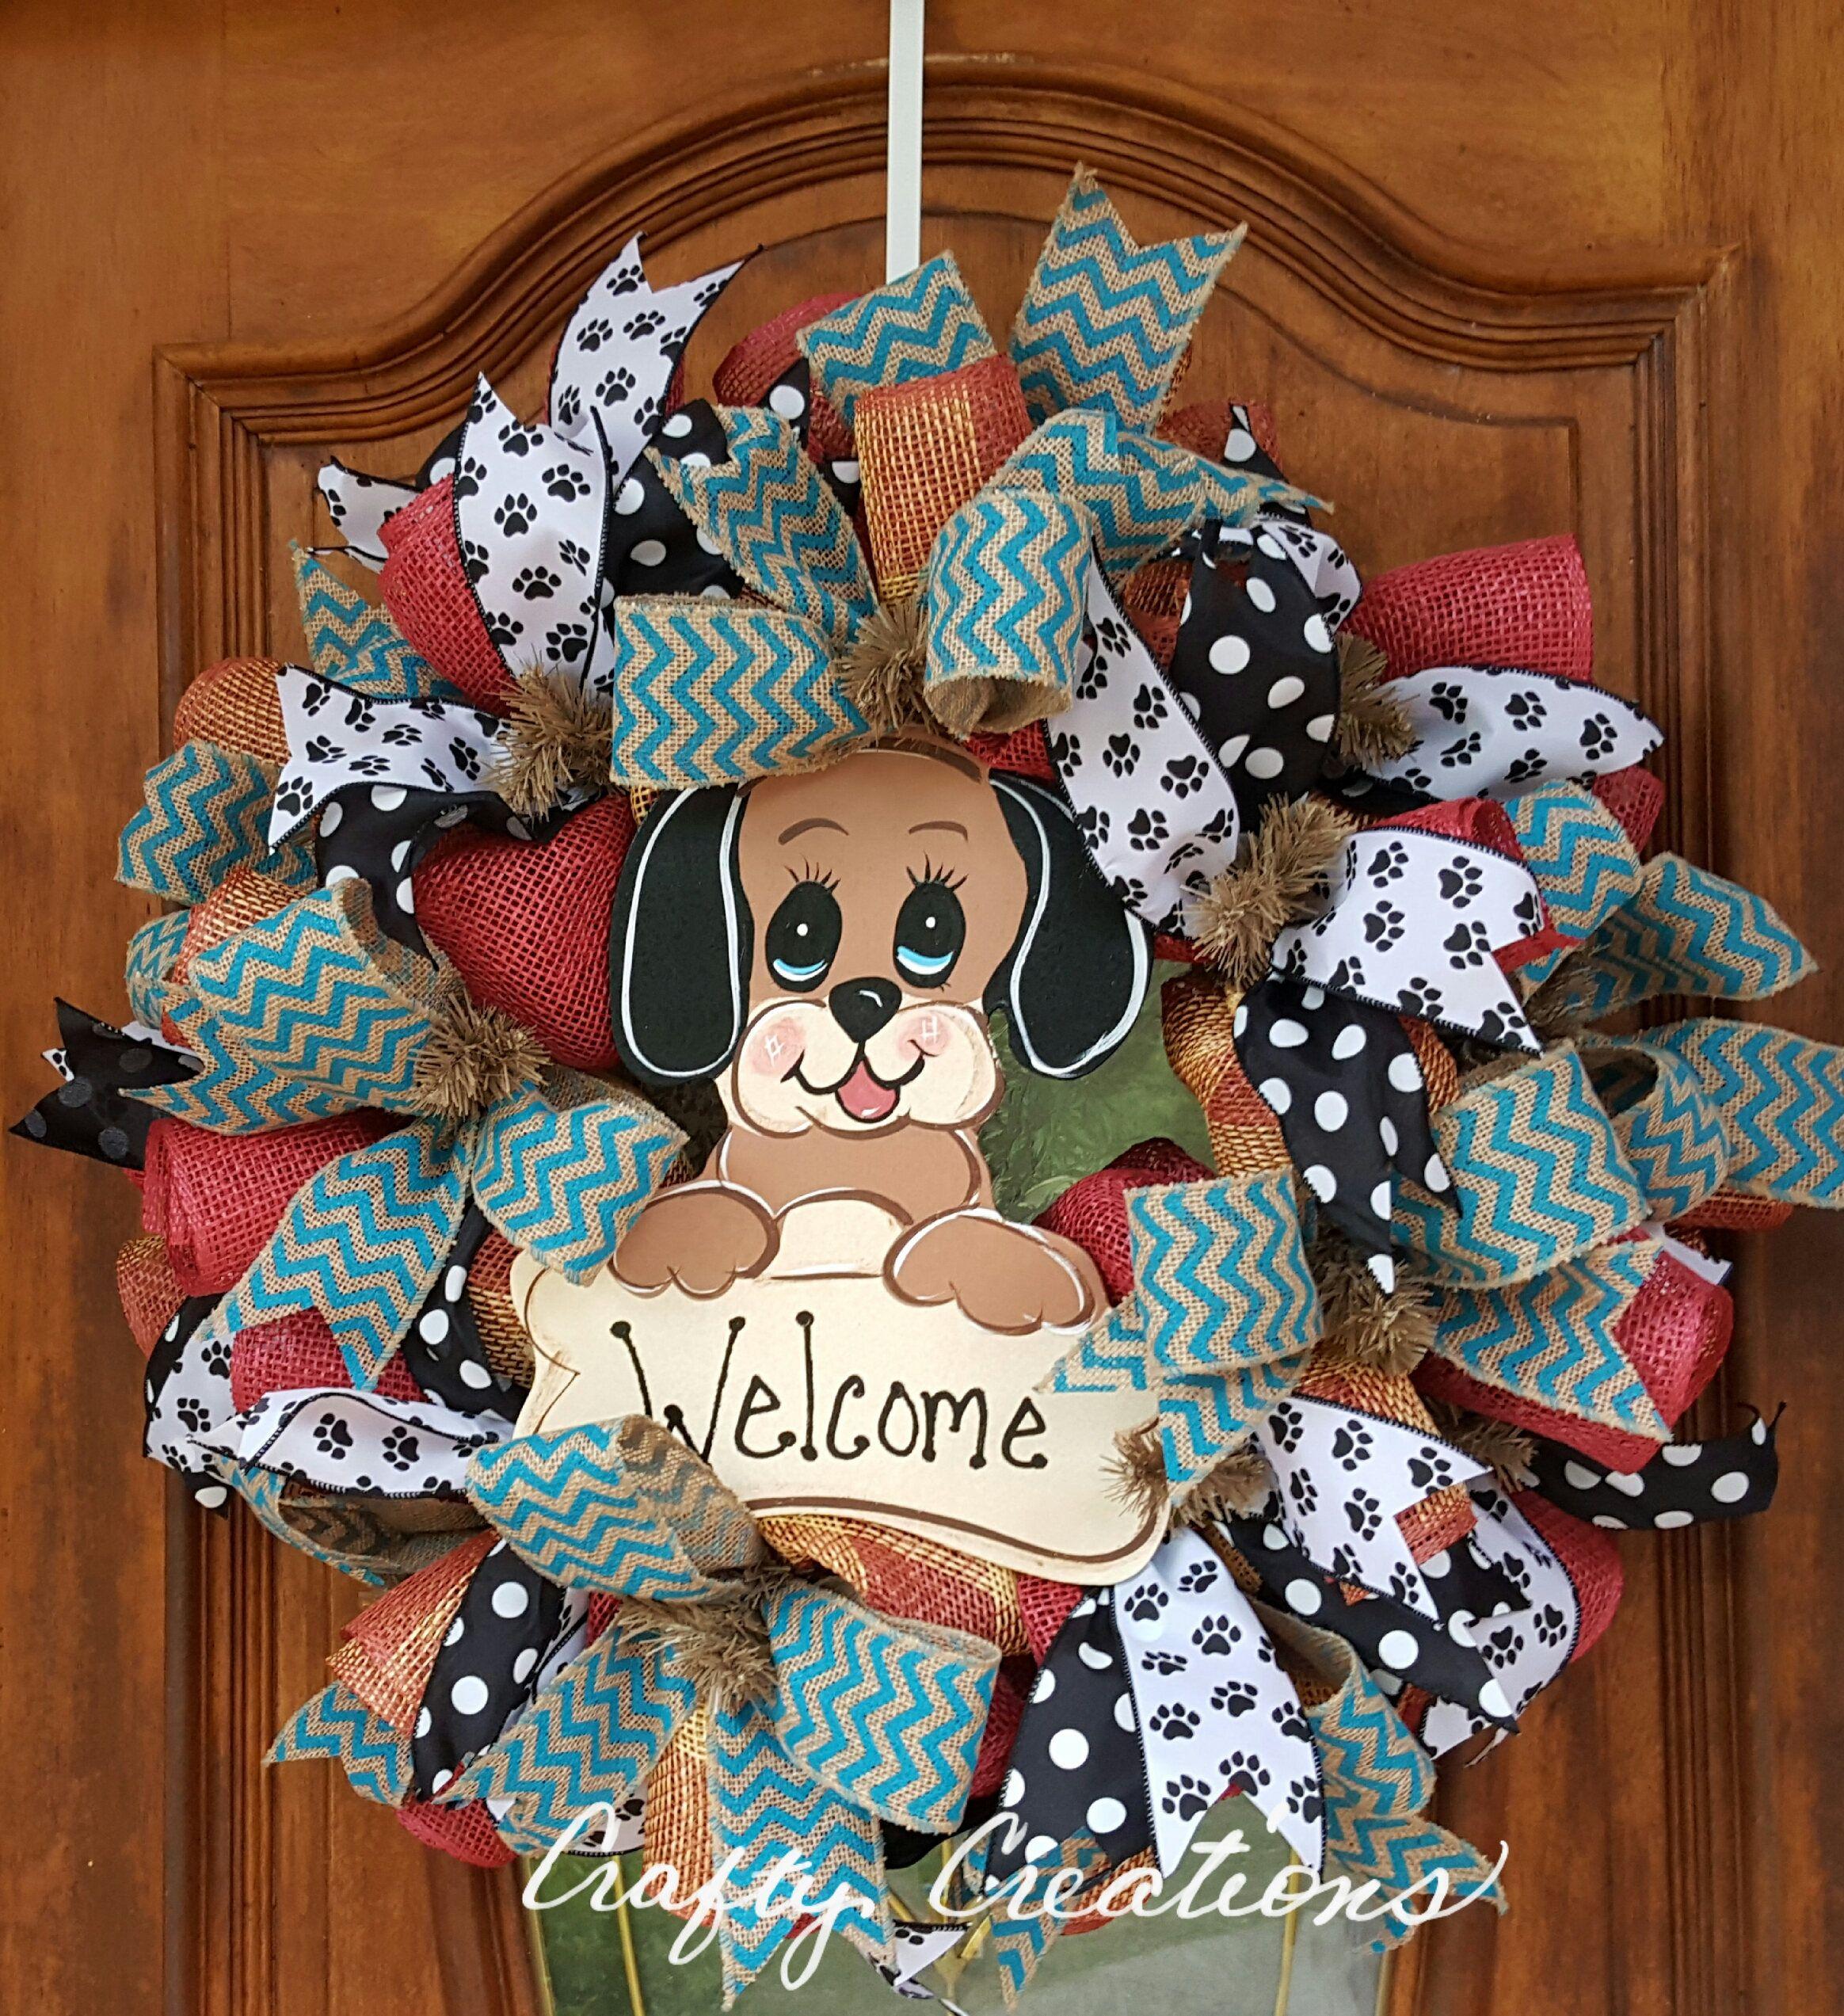 Puppy love welcome wreath everyday wreath dog lovers wreath puppy love welcome wreath everyday wreath dog lovers wreath doggie decor front door decor rubansaba